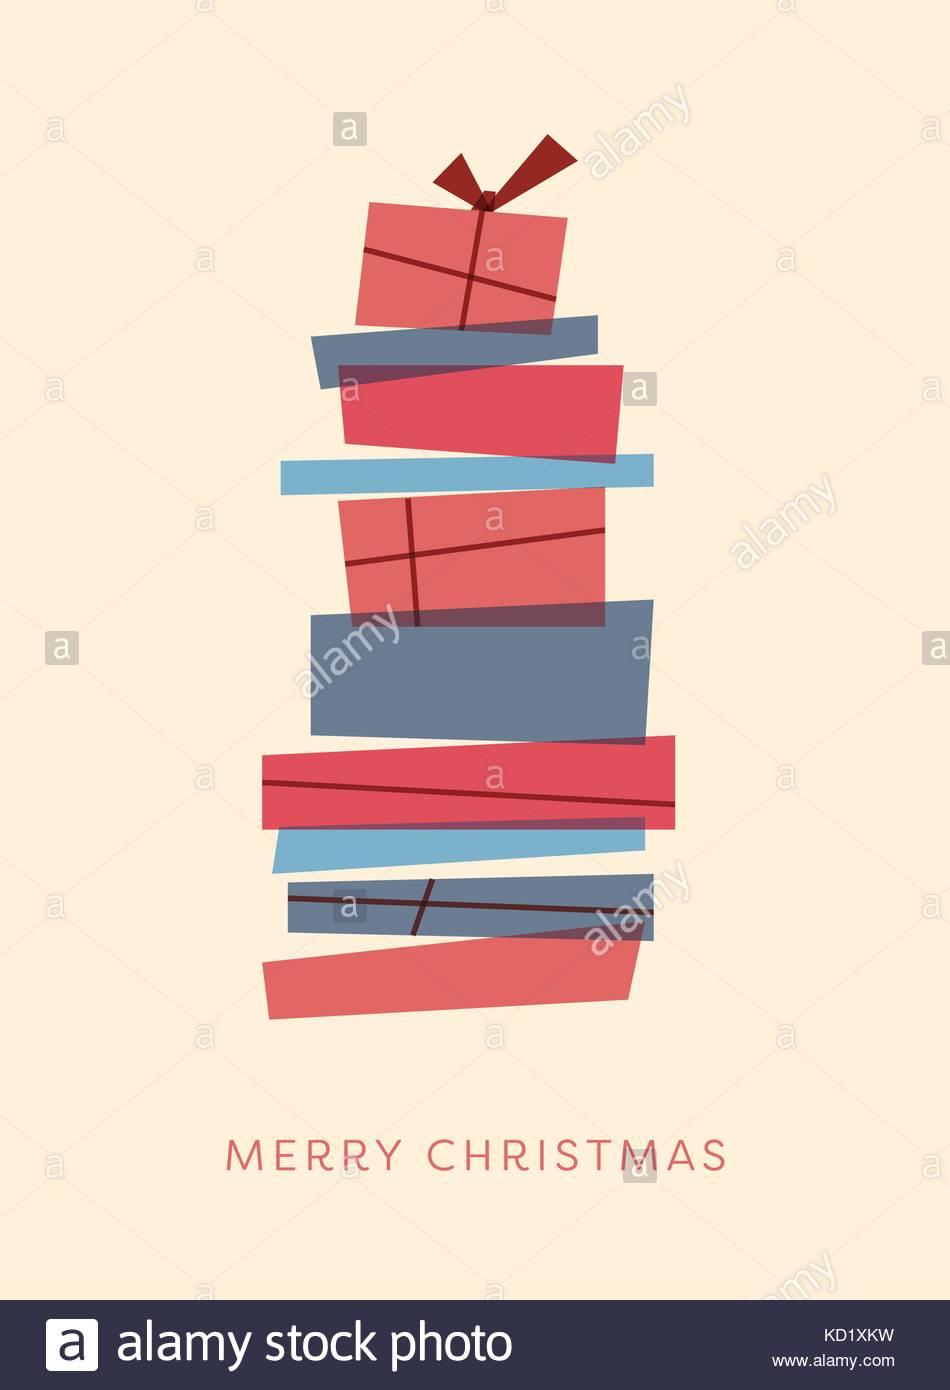 merry christmas card template with retro vintage overlay christmas